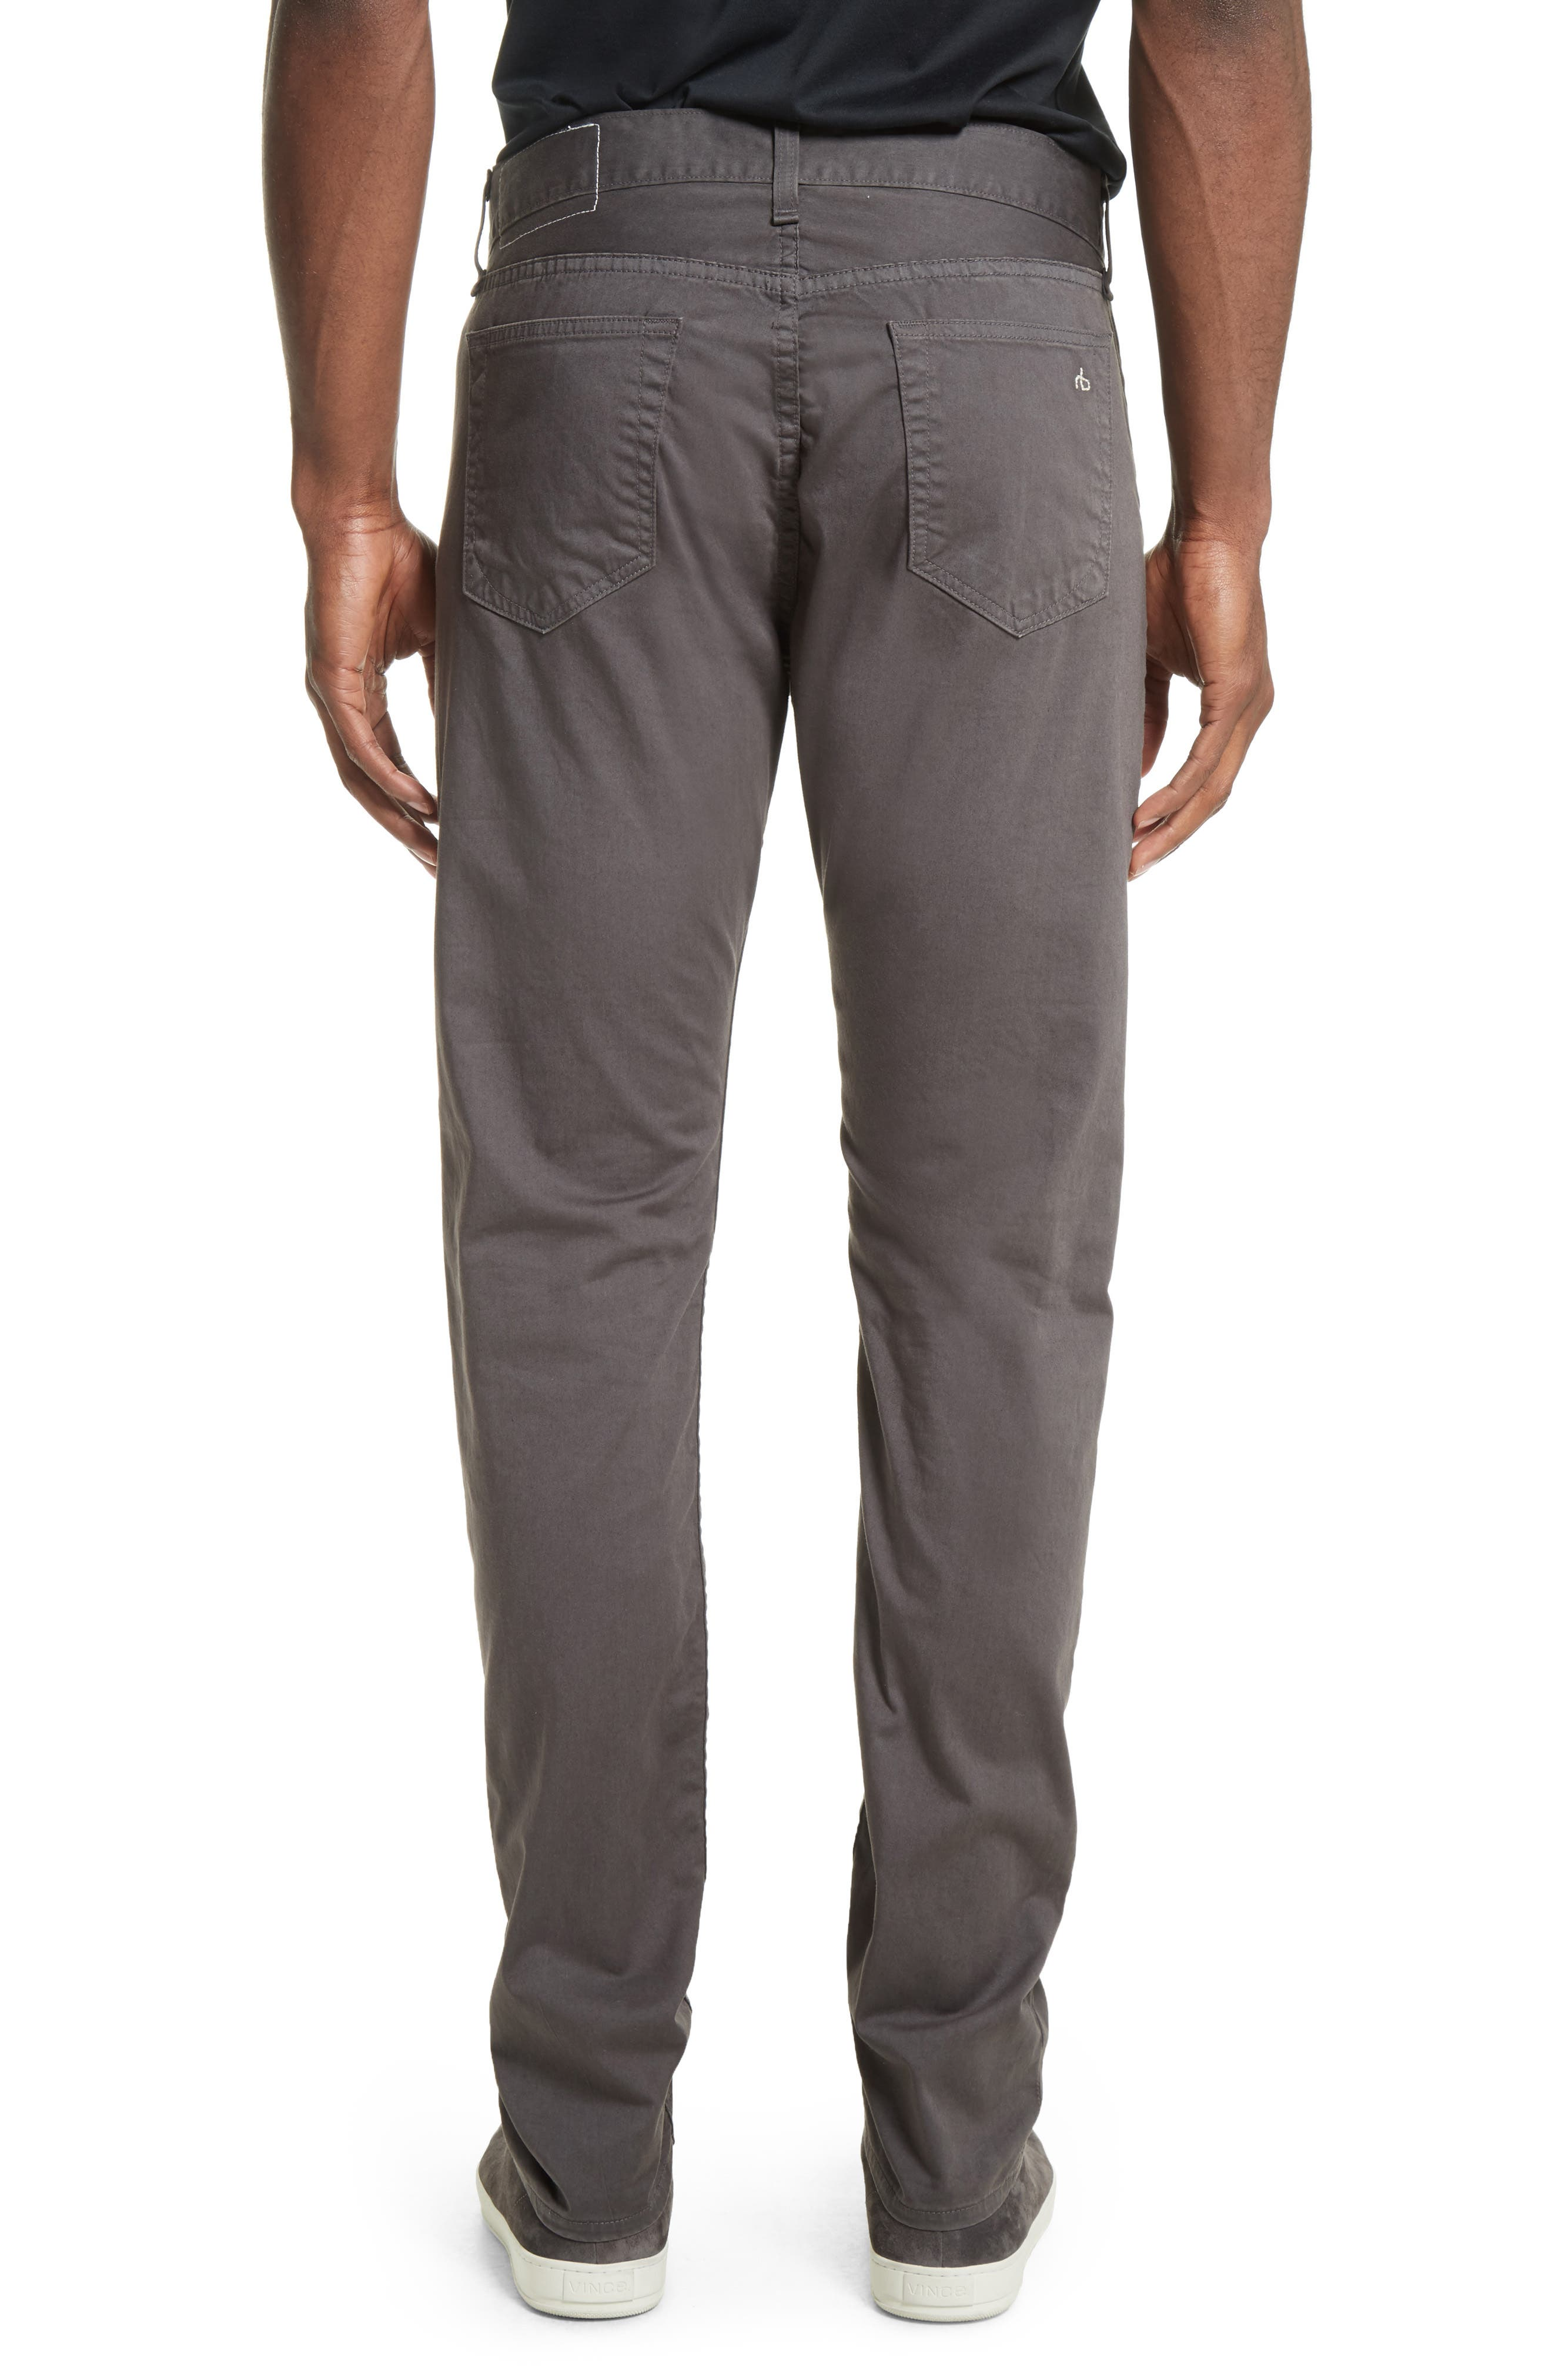 Fit 2 Slim Five-Pocket Pants,                             Alternate thumbnail 2, color,                             GREY